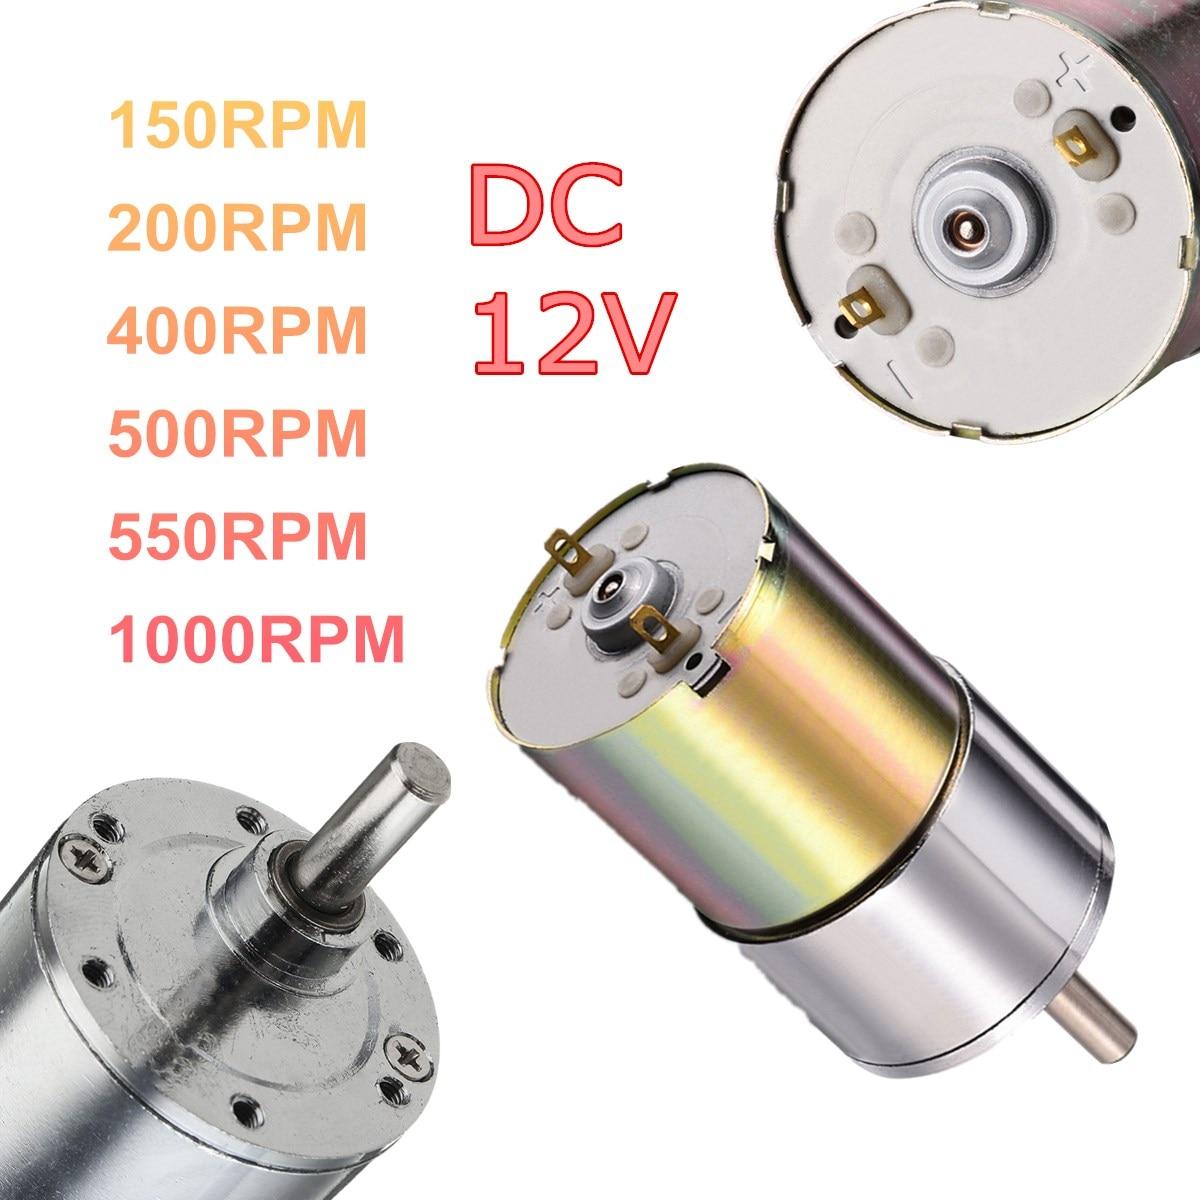 DC 12V 150/200/400/500/550/1000 RPM Powerful High Torque Electric Gear Box Motor Speed ReductionDC 12V 150/200/400/500/550/1000 RPM Powerful High Torque Electric Gear Box Motor Speed Reduction